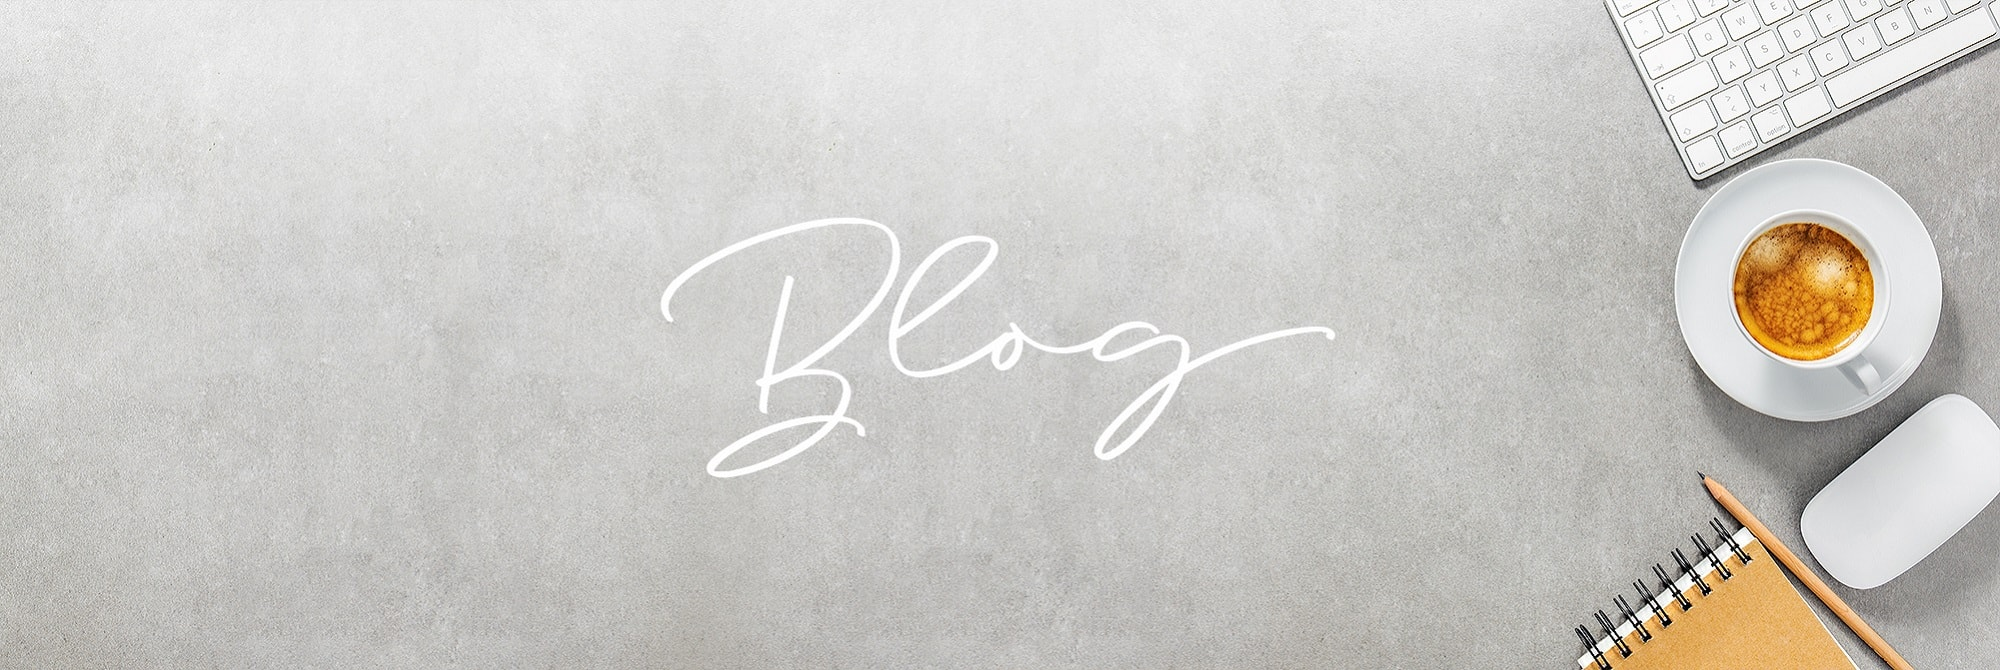 Aletia's Blog